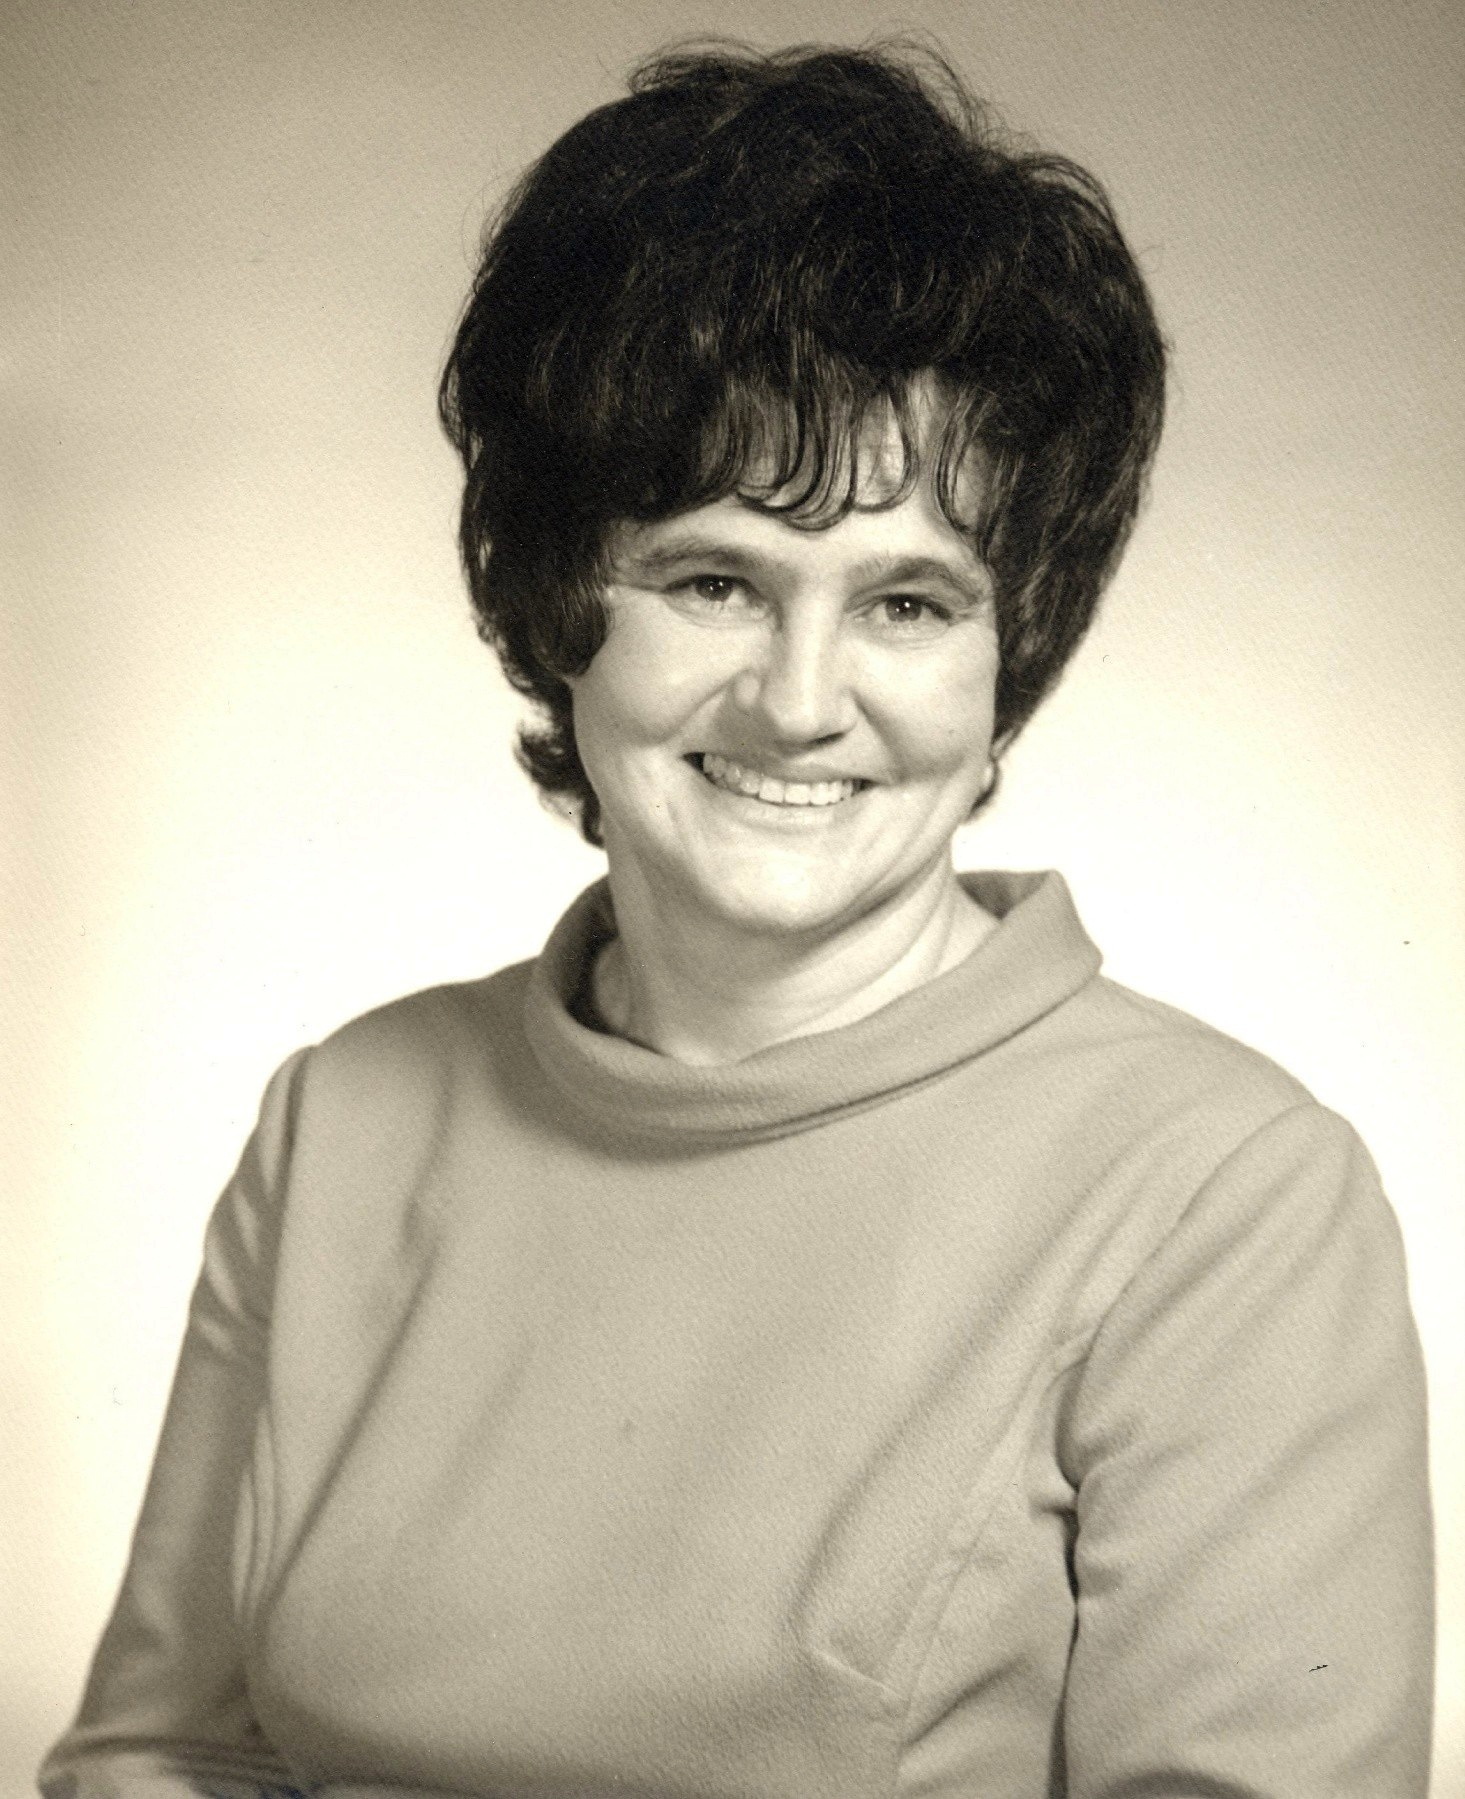 Judy Cornwell (born 1940),Dorothy Boyd Porno image Steffani Brass,January Jones born January 5, 1978 (age 40)